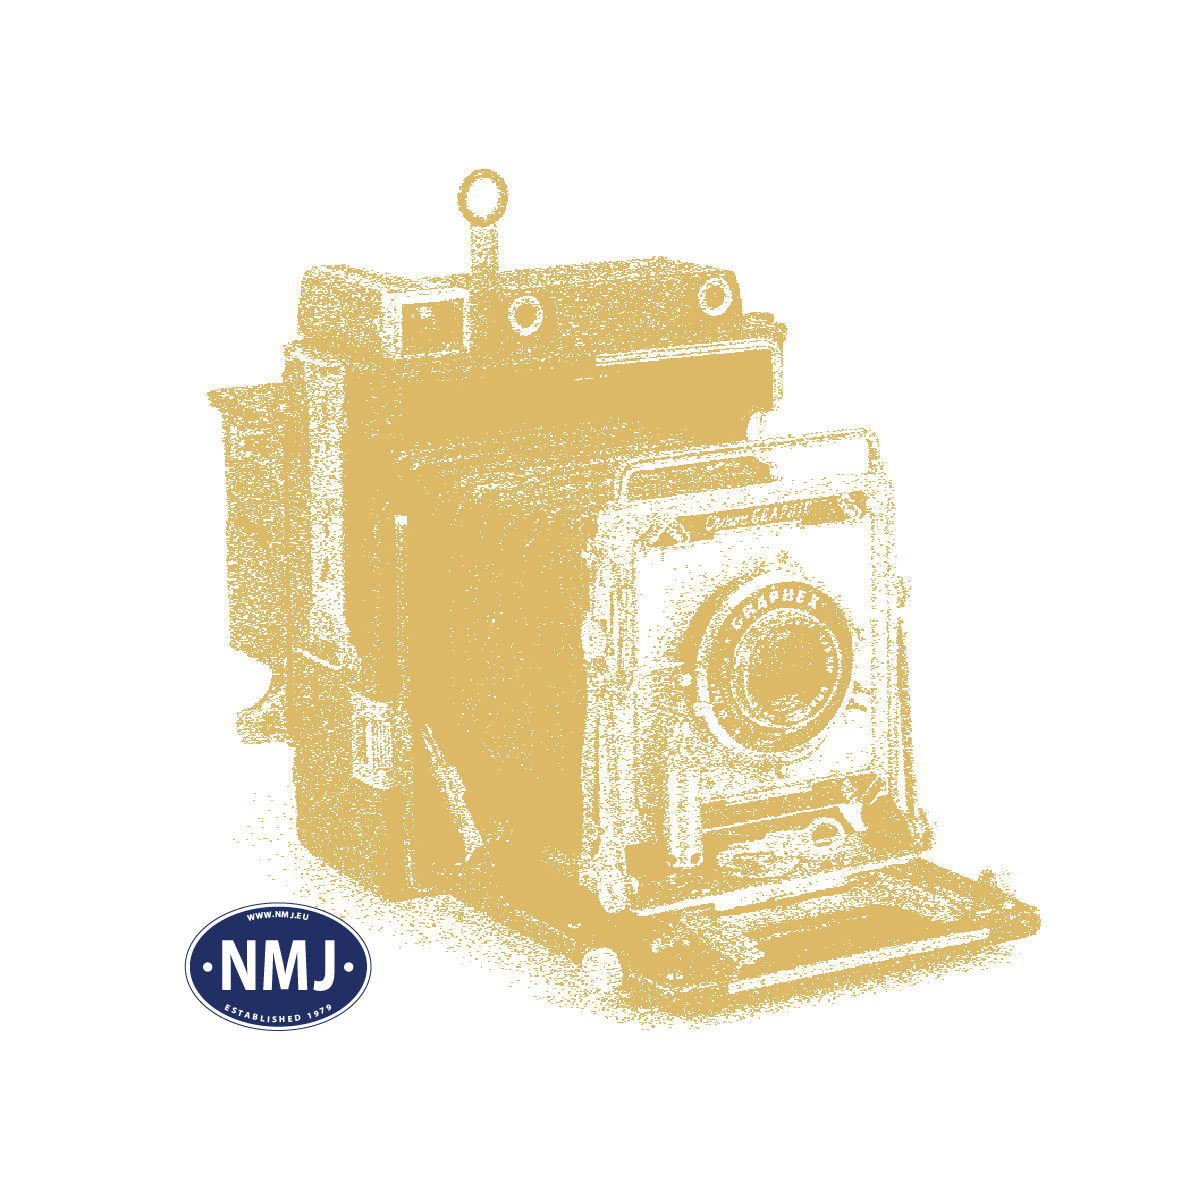 NMJT90301 - NMJ Topline CFL 1602 (1971 -->), DC